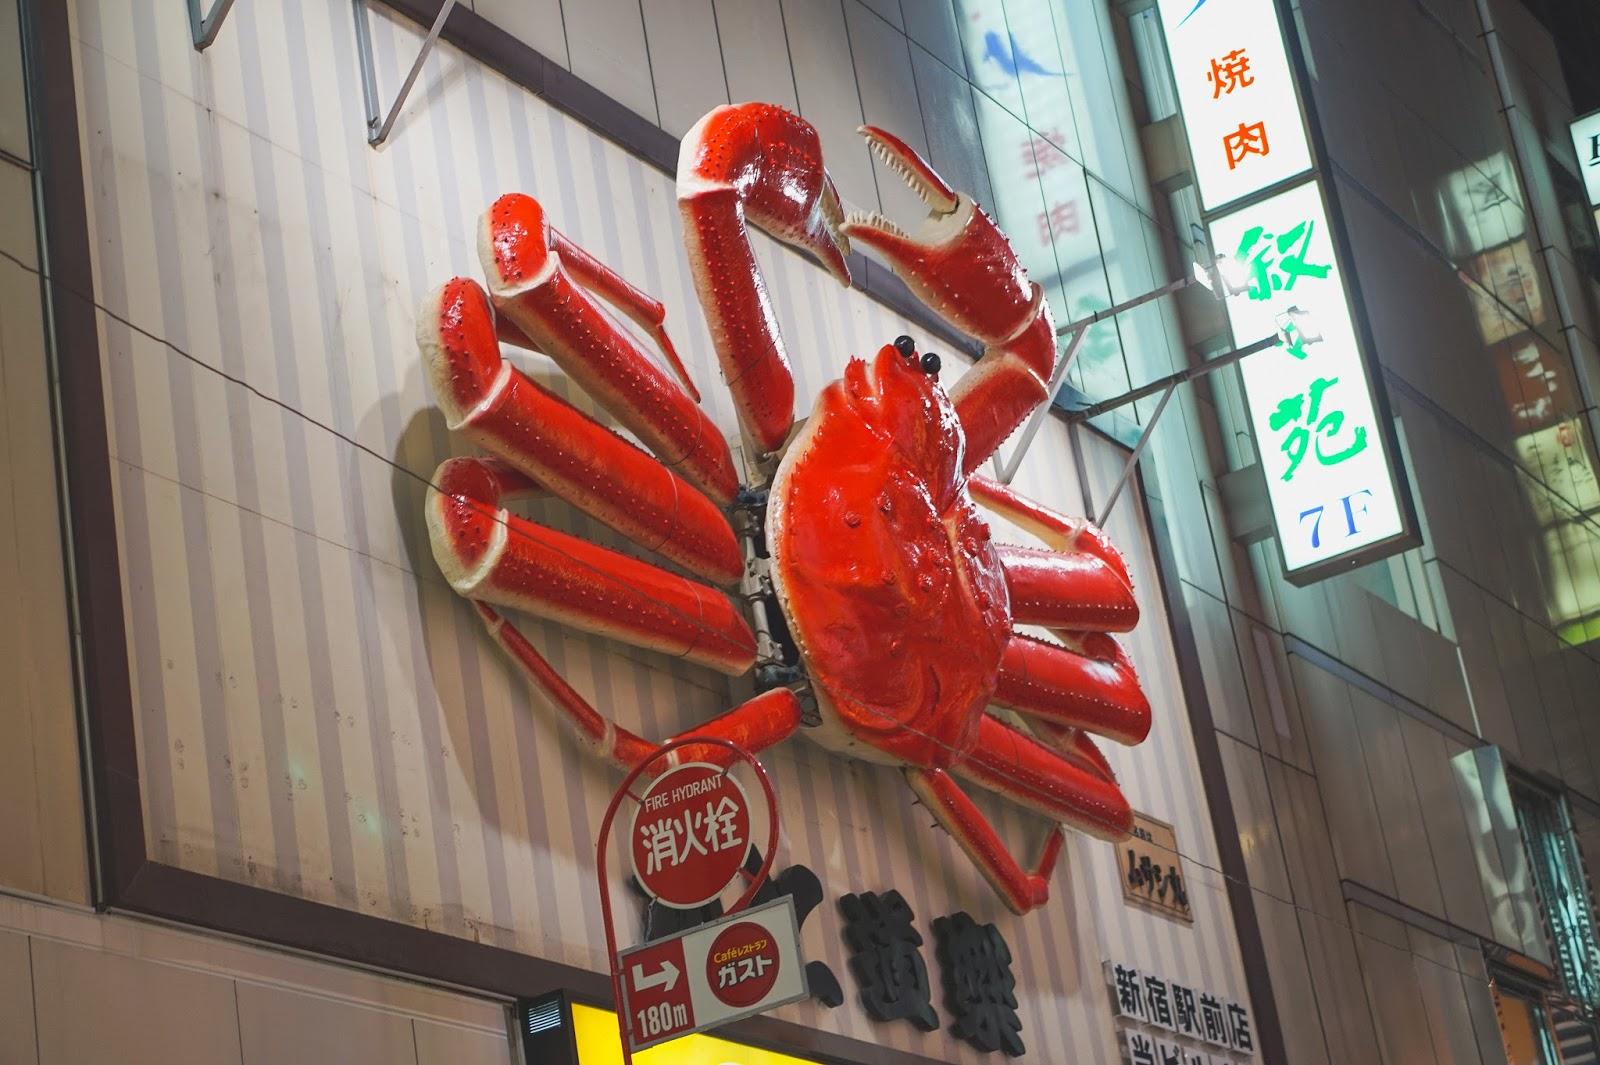 Tokyo Bills Omotesando Tokyu Plaza Japan Solo Travel